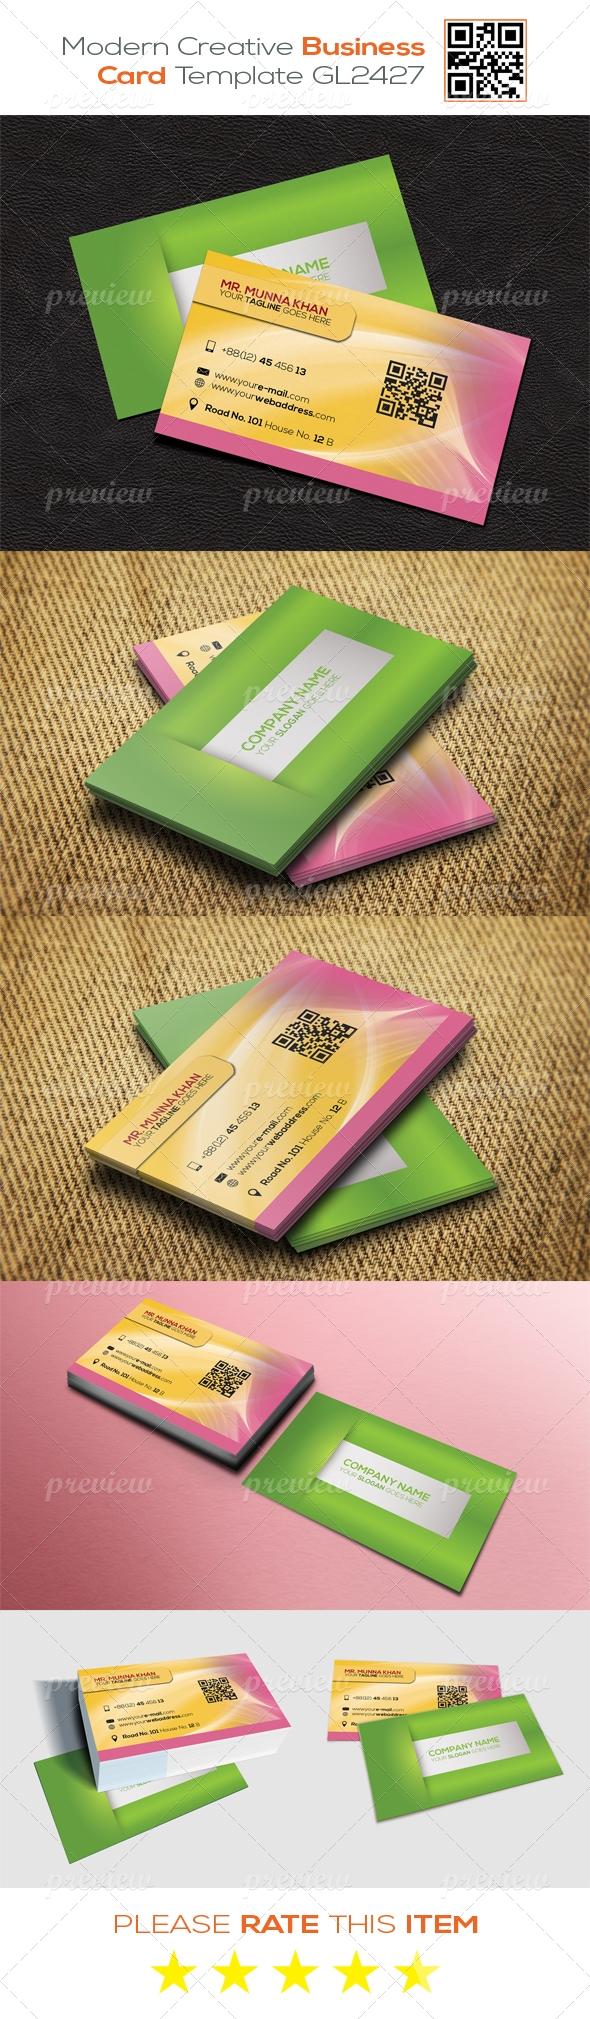 Modern Creative Business Card Template GL2427